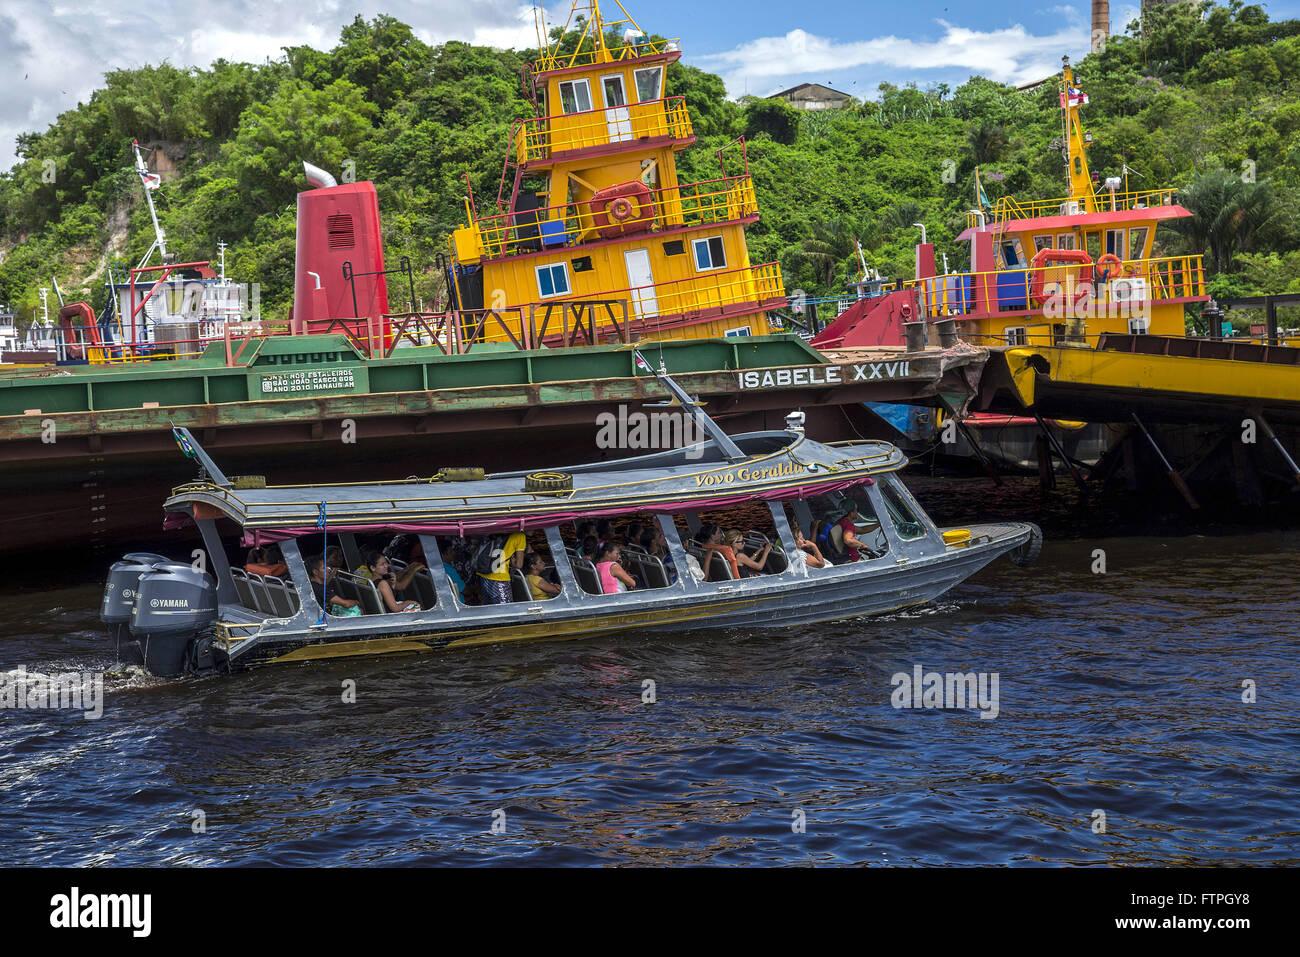 Passenger vessel in the port of Ceasa - Rio Negro - Stock Image